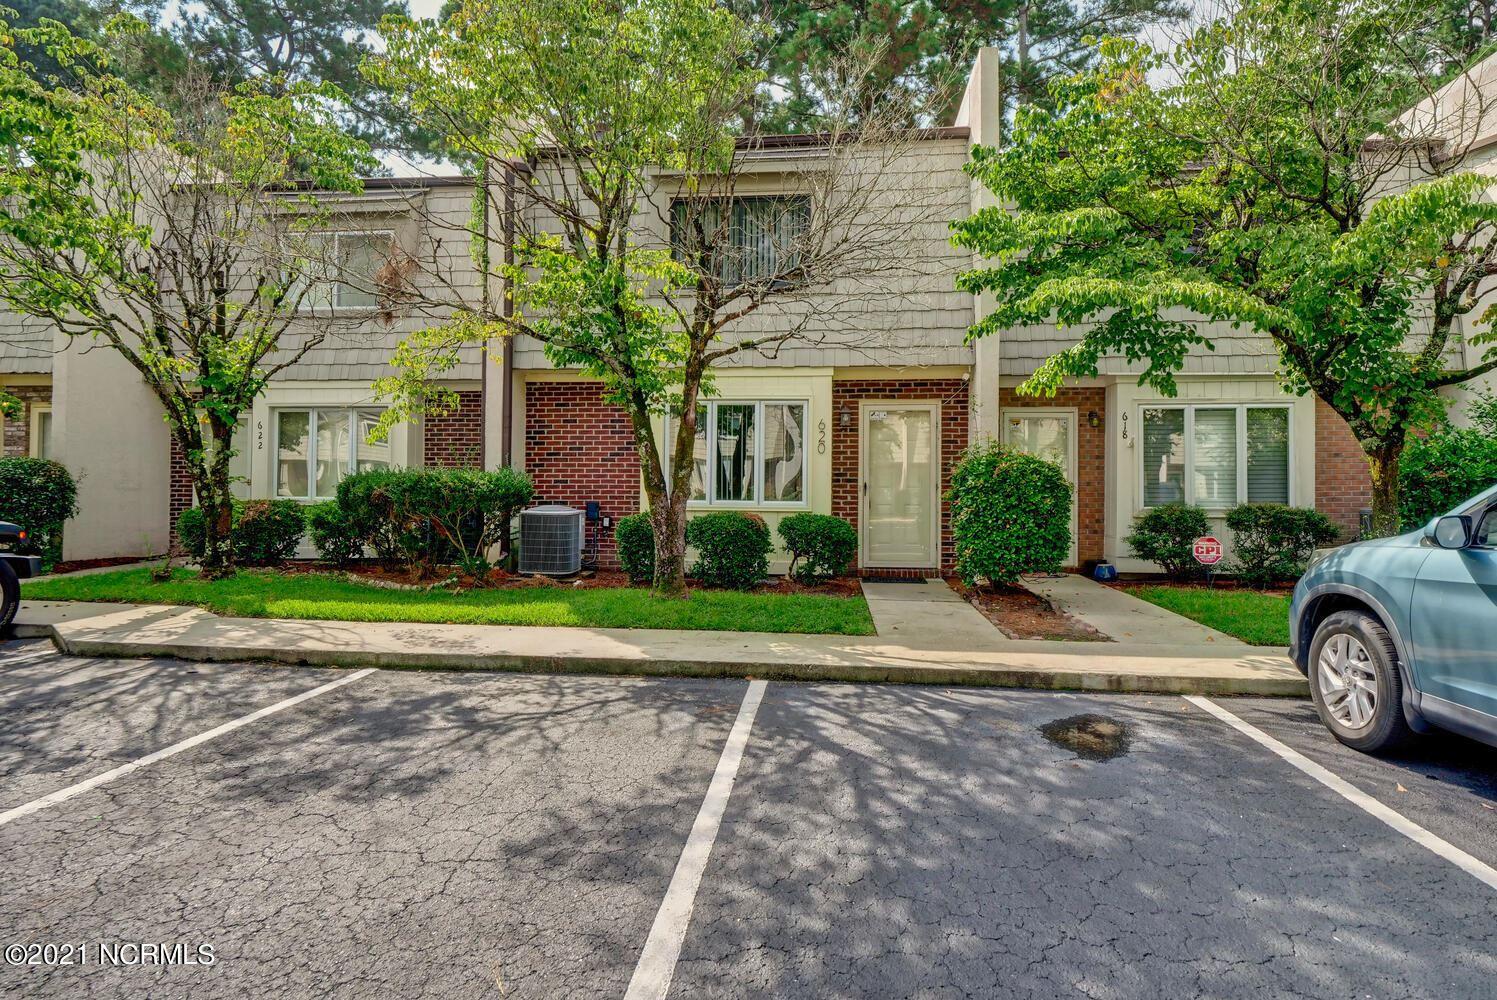 Photo of 620 Cobblestone Drive #620, Wilmington, NC 28405 (MLS # 100288229)